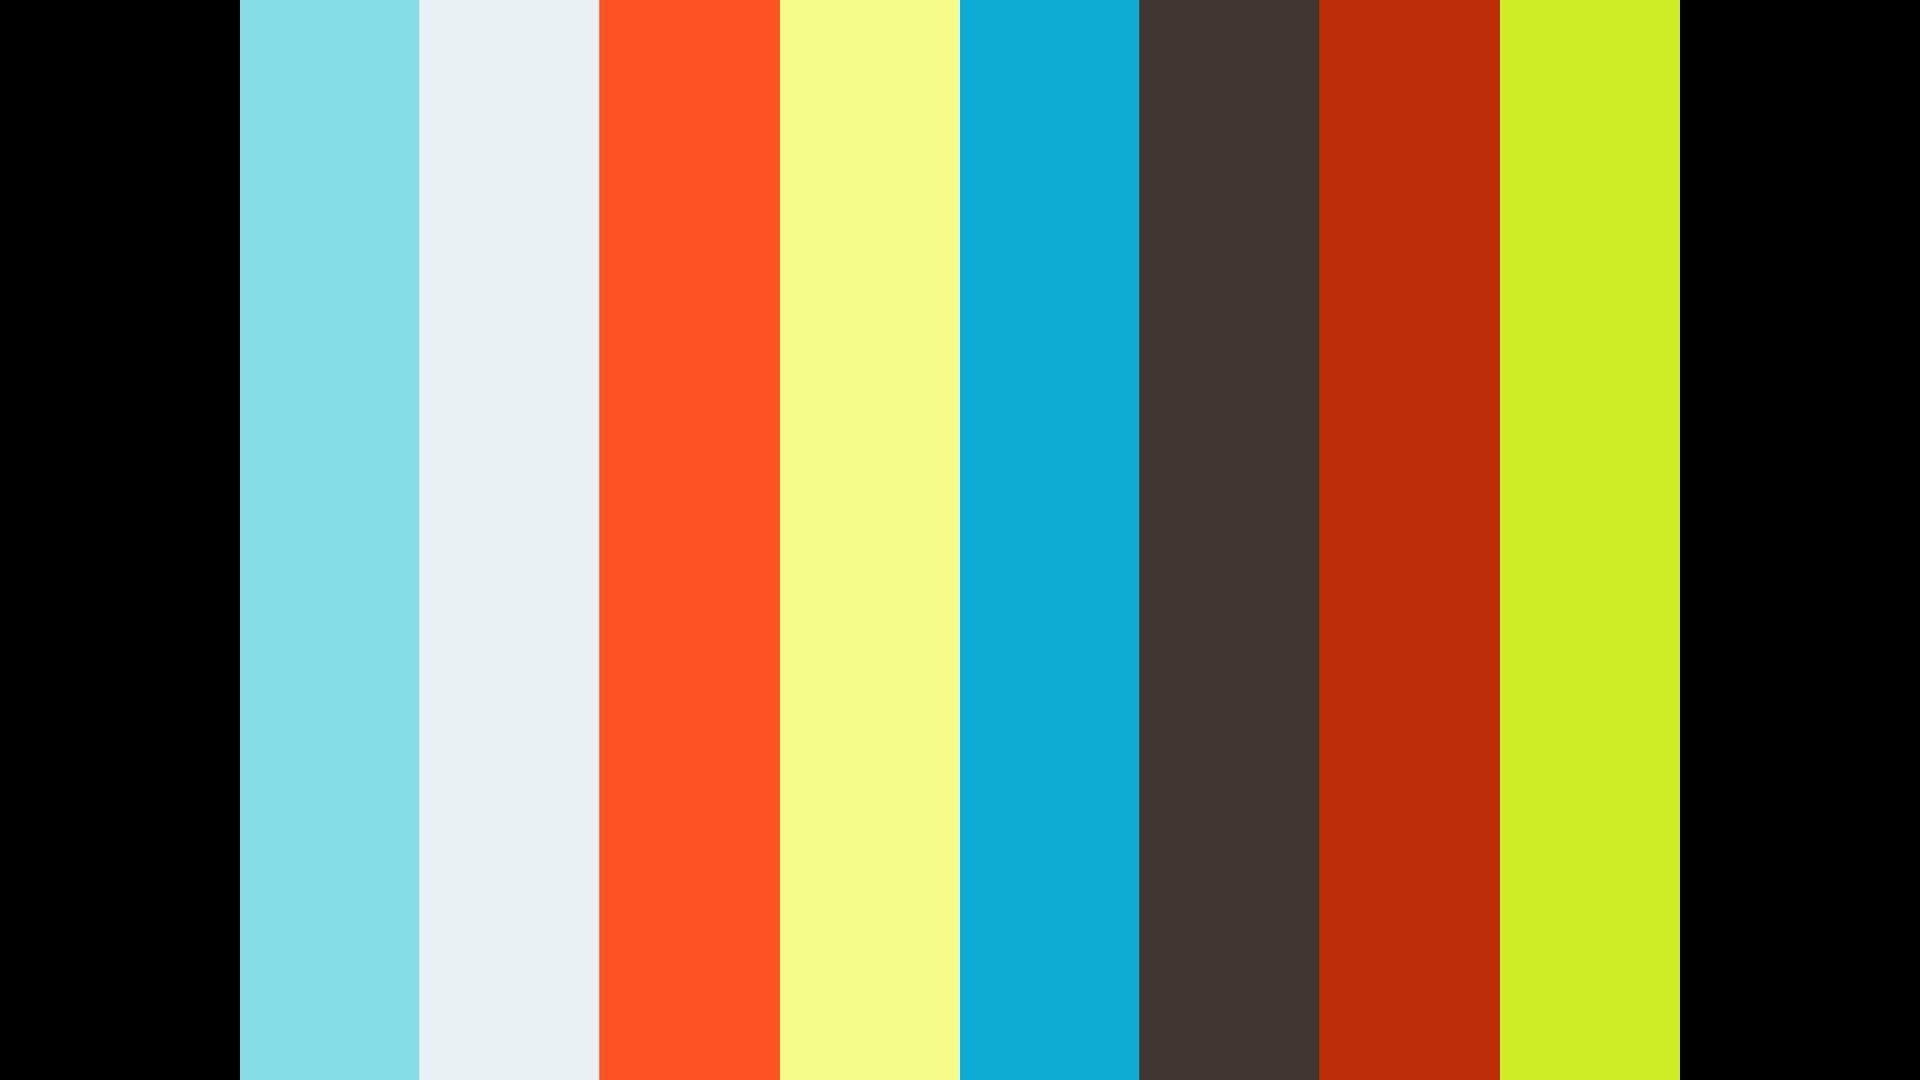 TRUCKISTAN — ٹرکستان